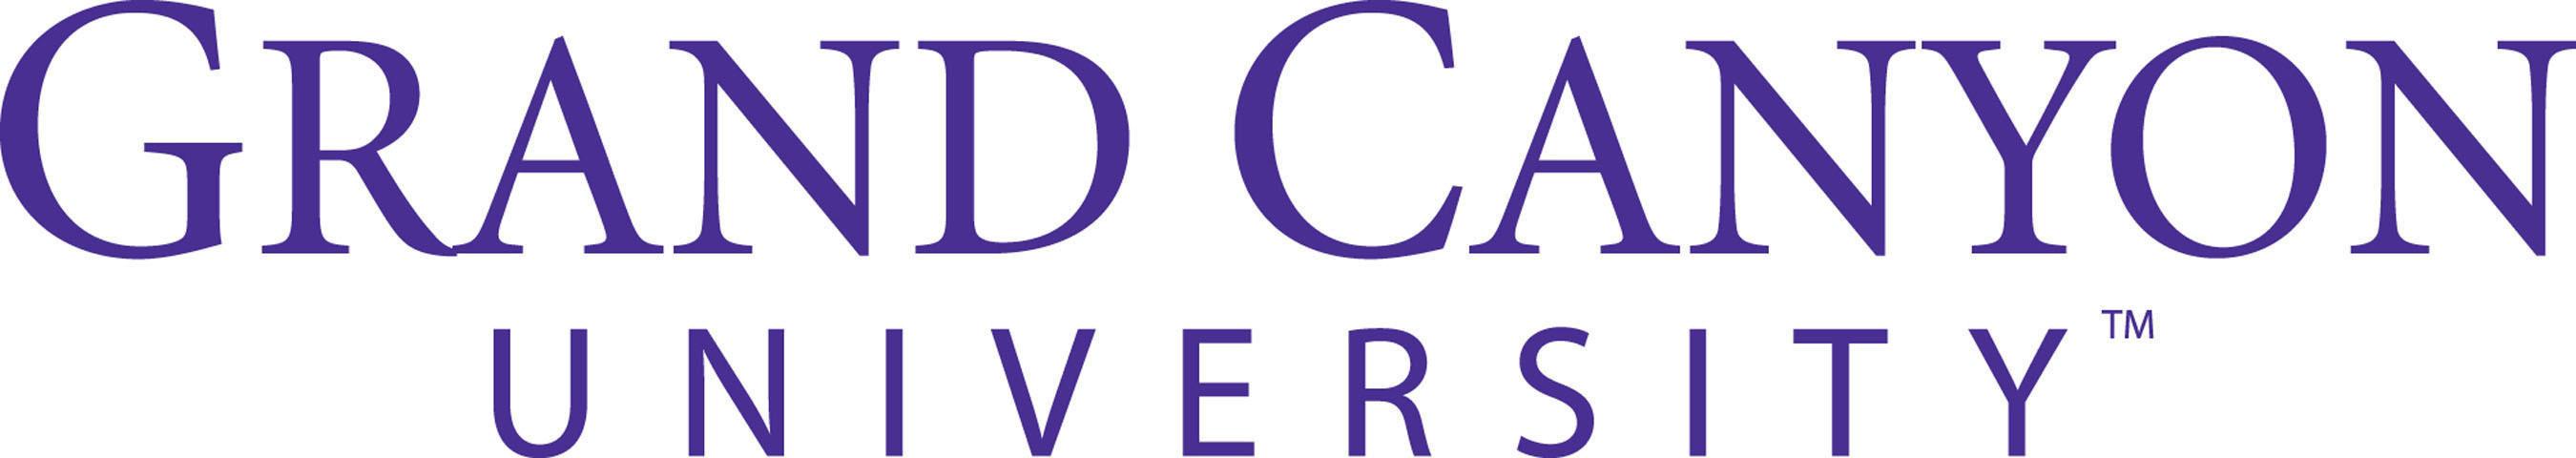 Grand Canyon University logo.